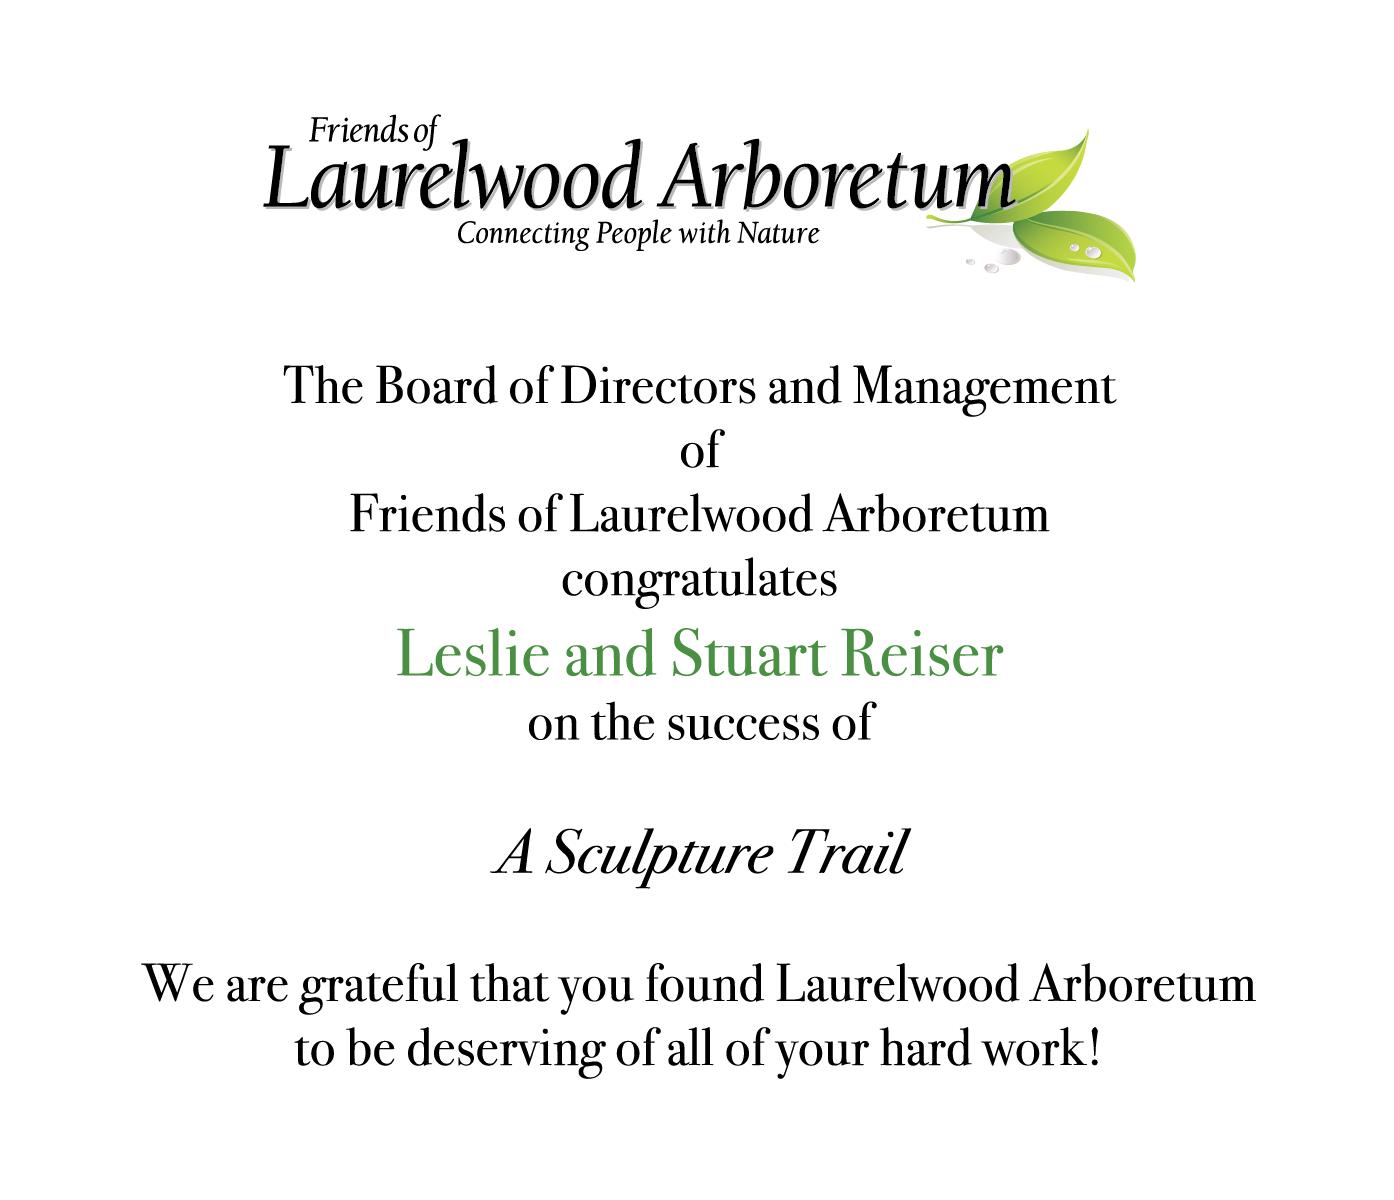 Board of Directors ad